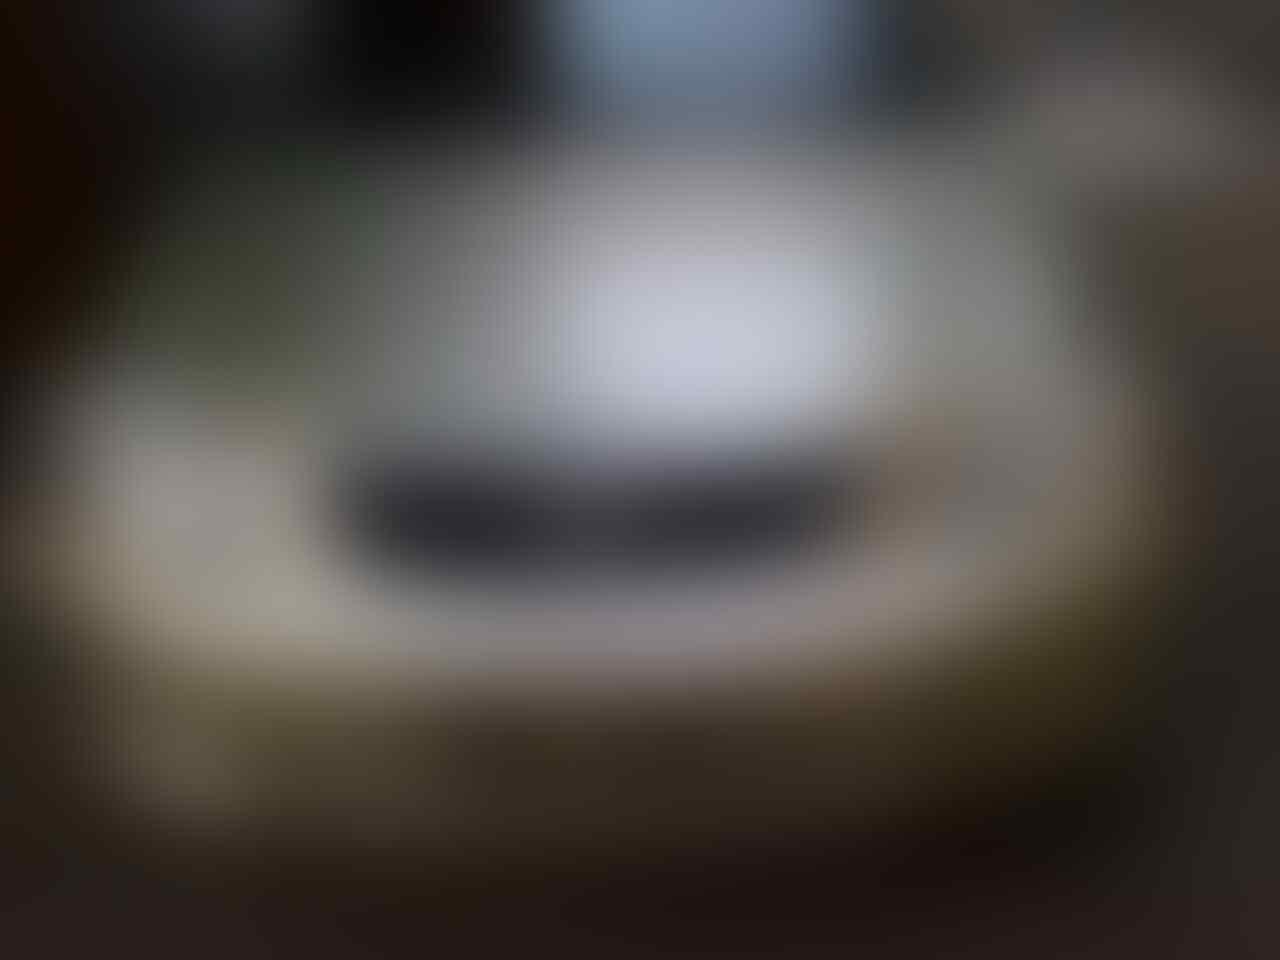 WTS Toyota Corolla Altis Type G 1.8 Th.2001 ISTIMEWA